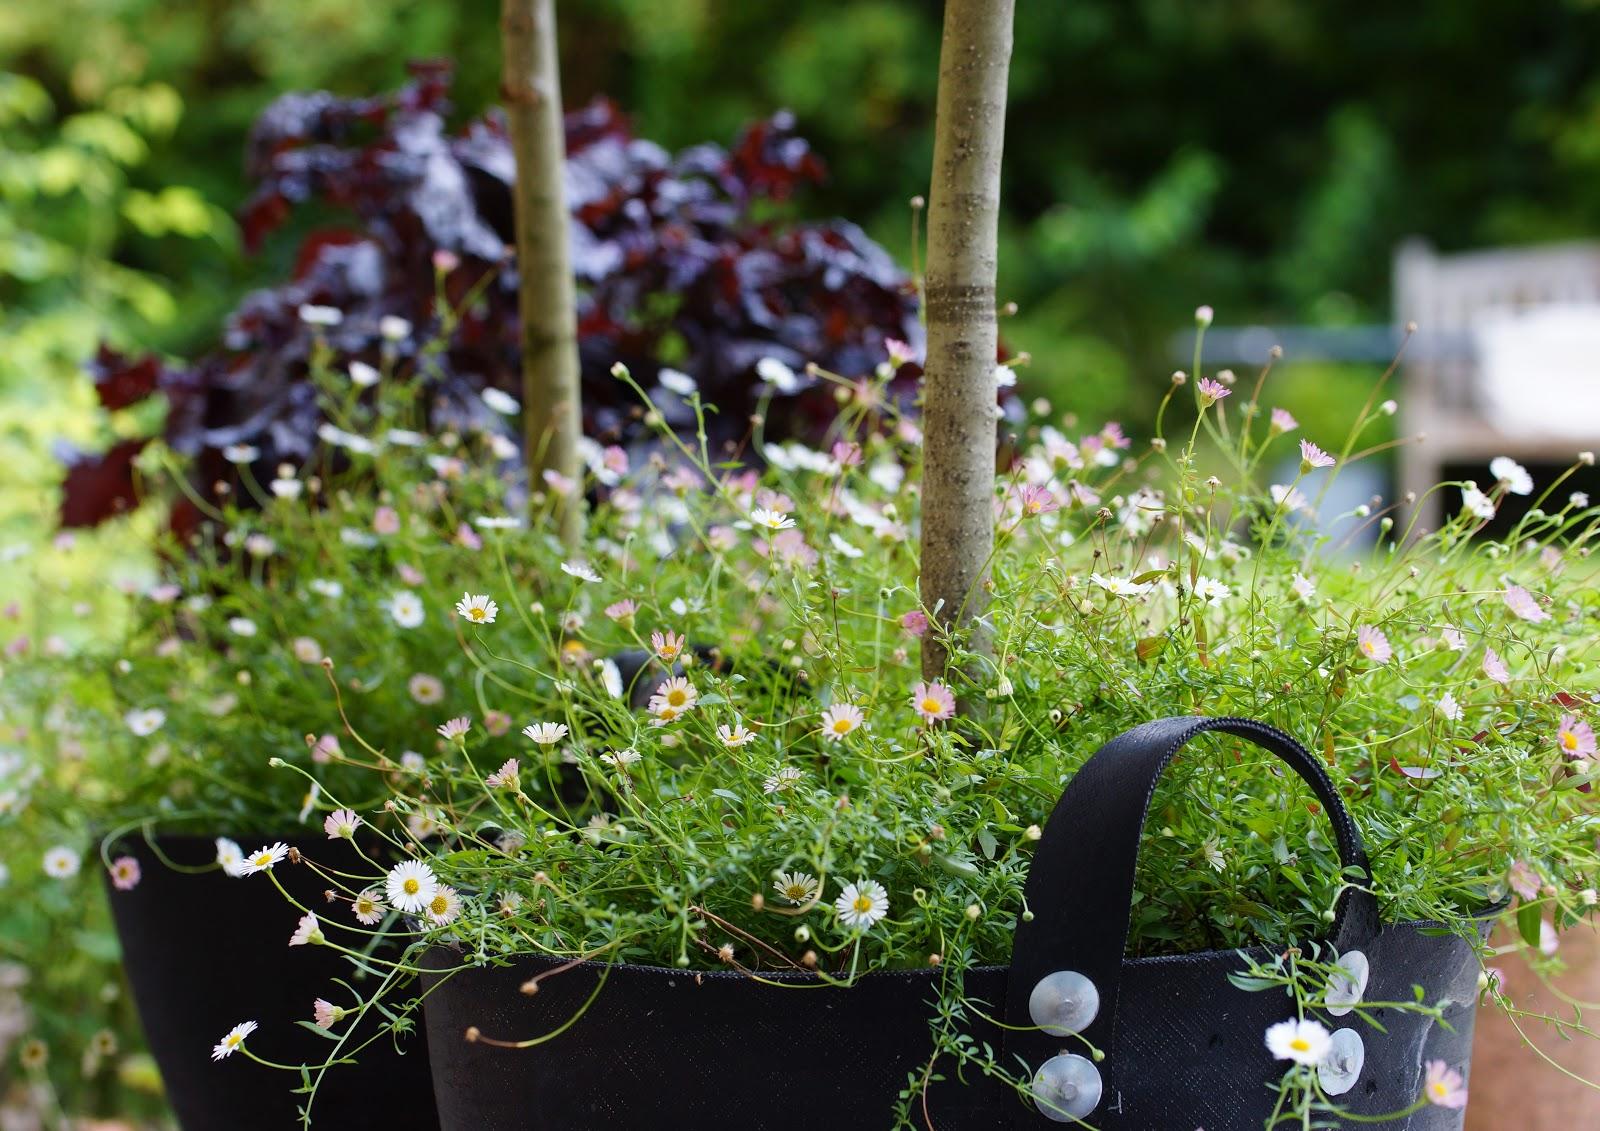 Fra frø til blomst: Bunddækkeplanter i krukker